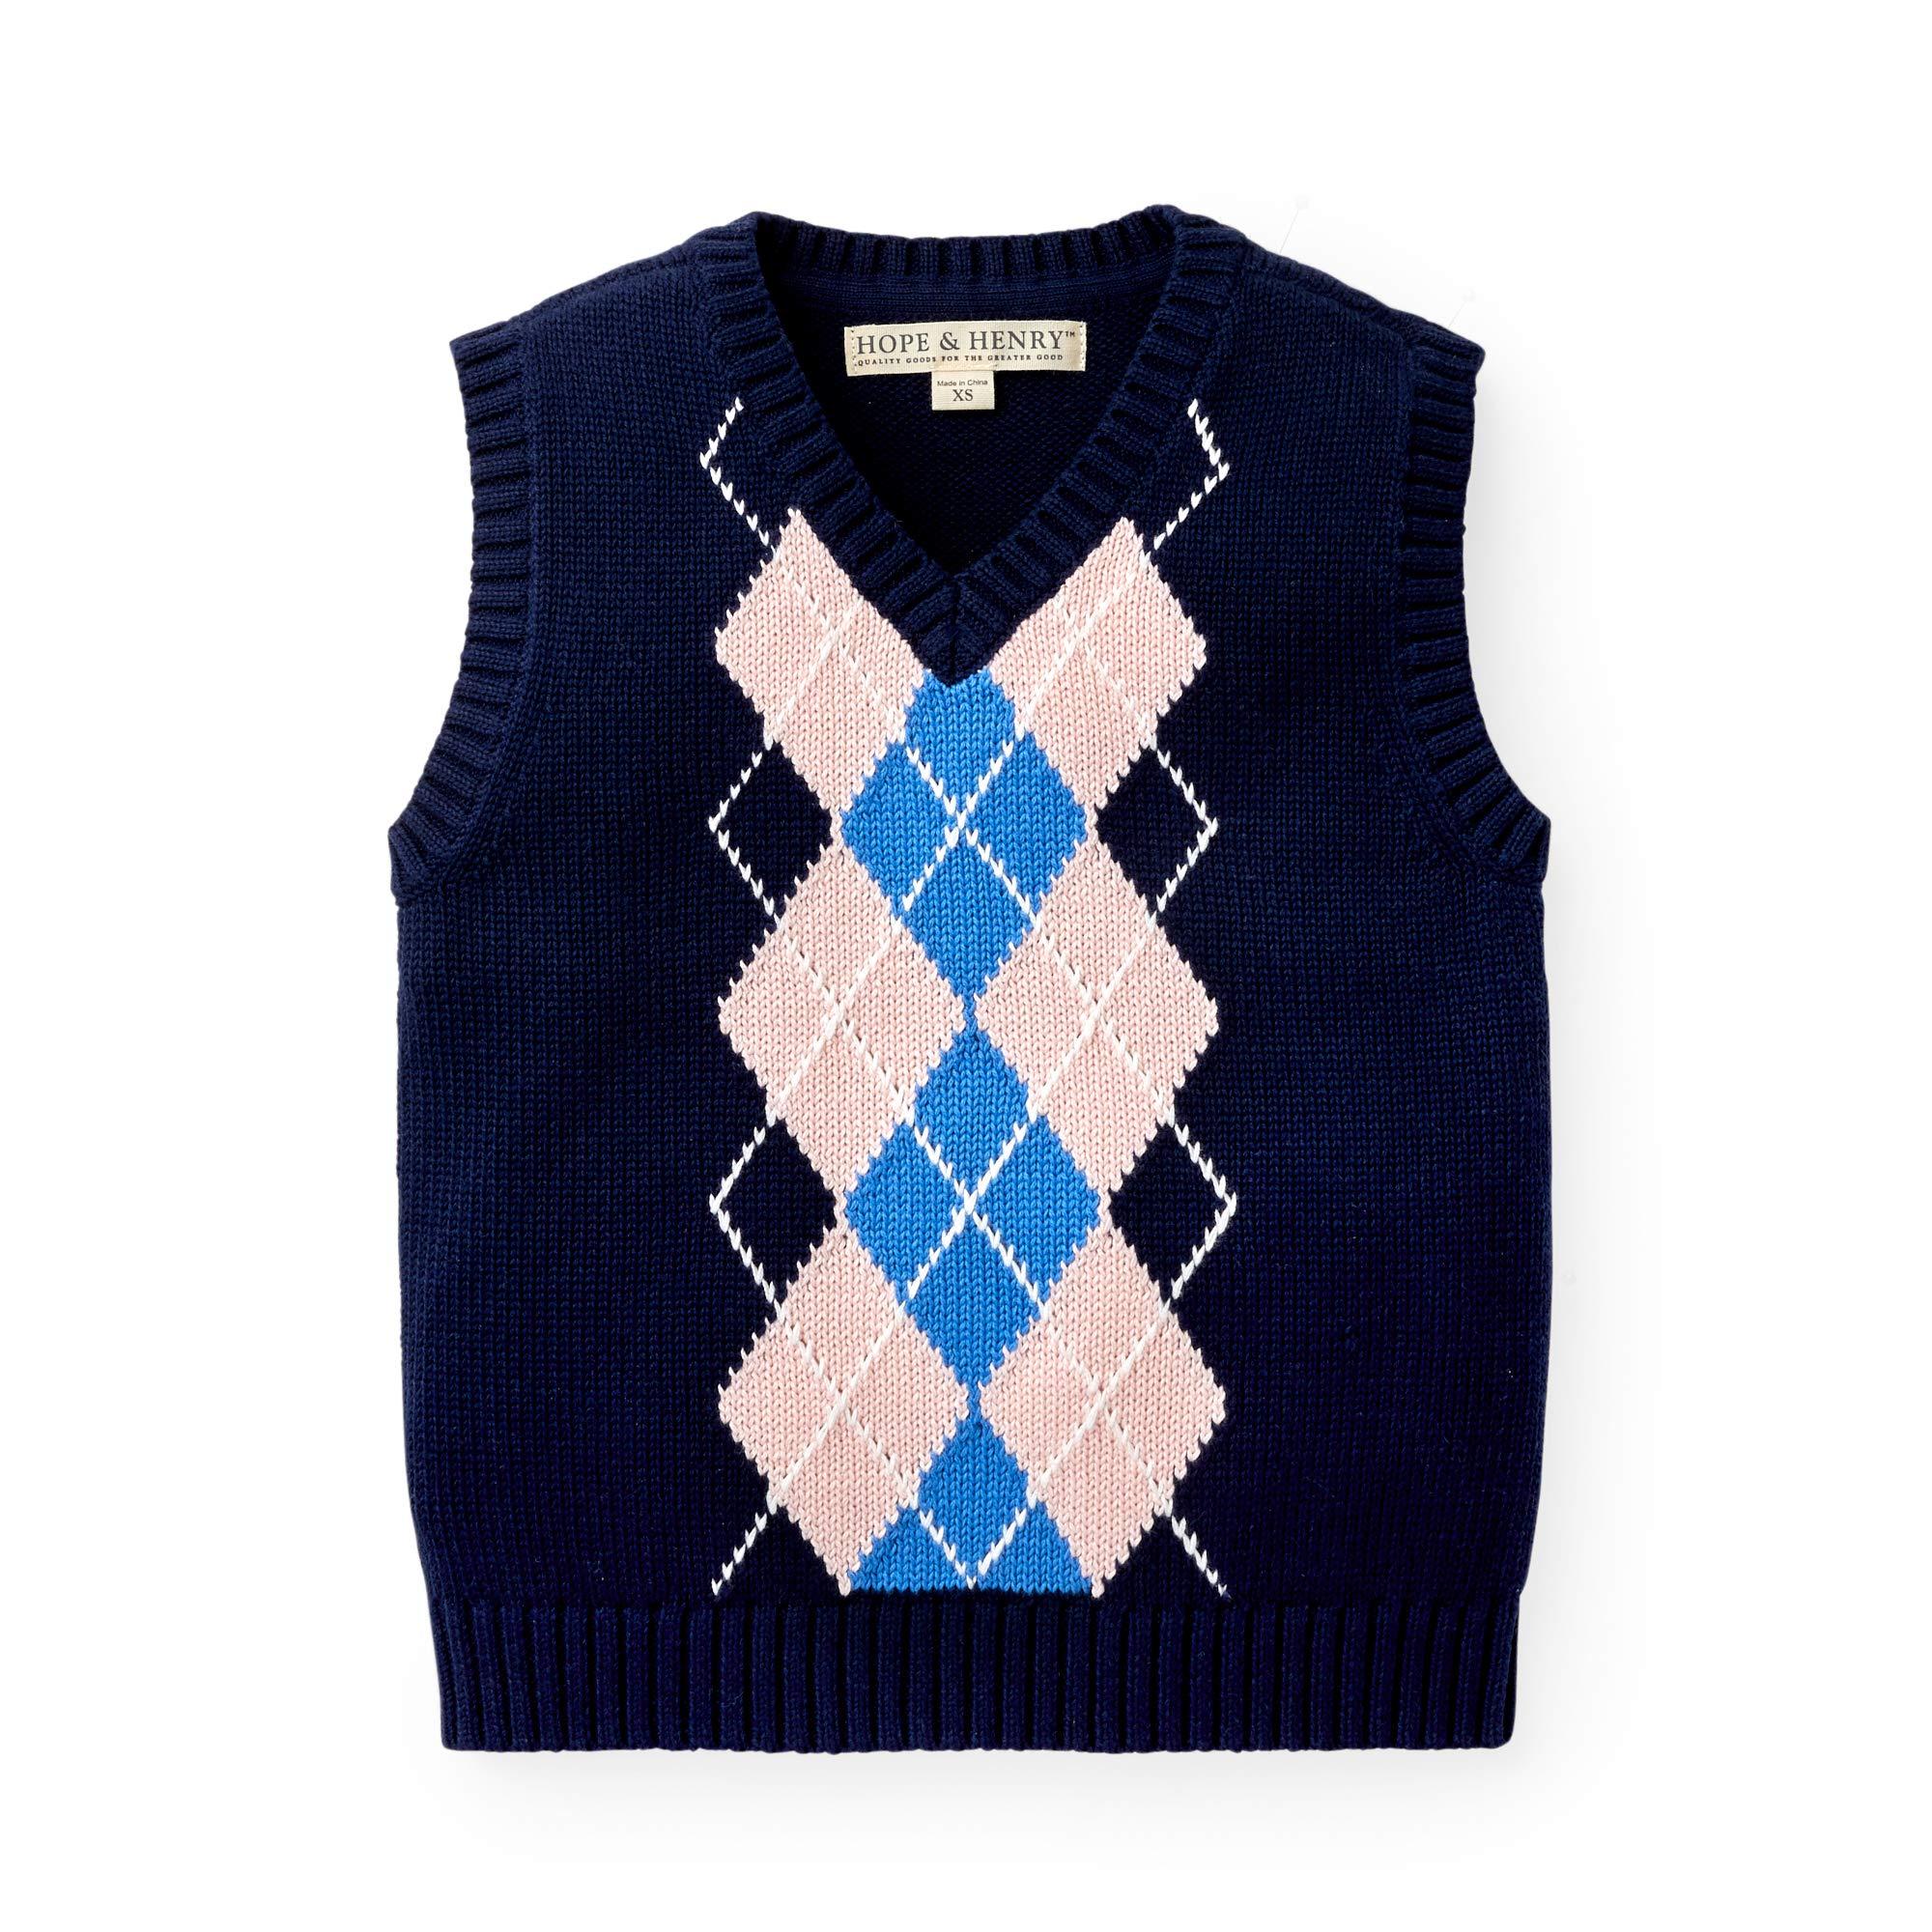 Hope & Henry Boys' Navy Argyle Cable Sweater Vest